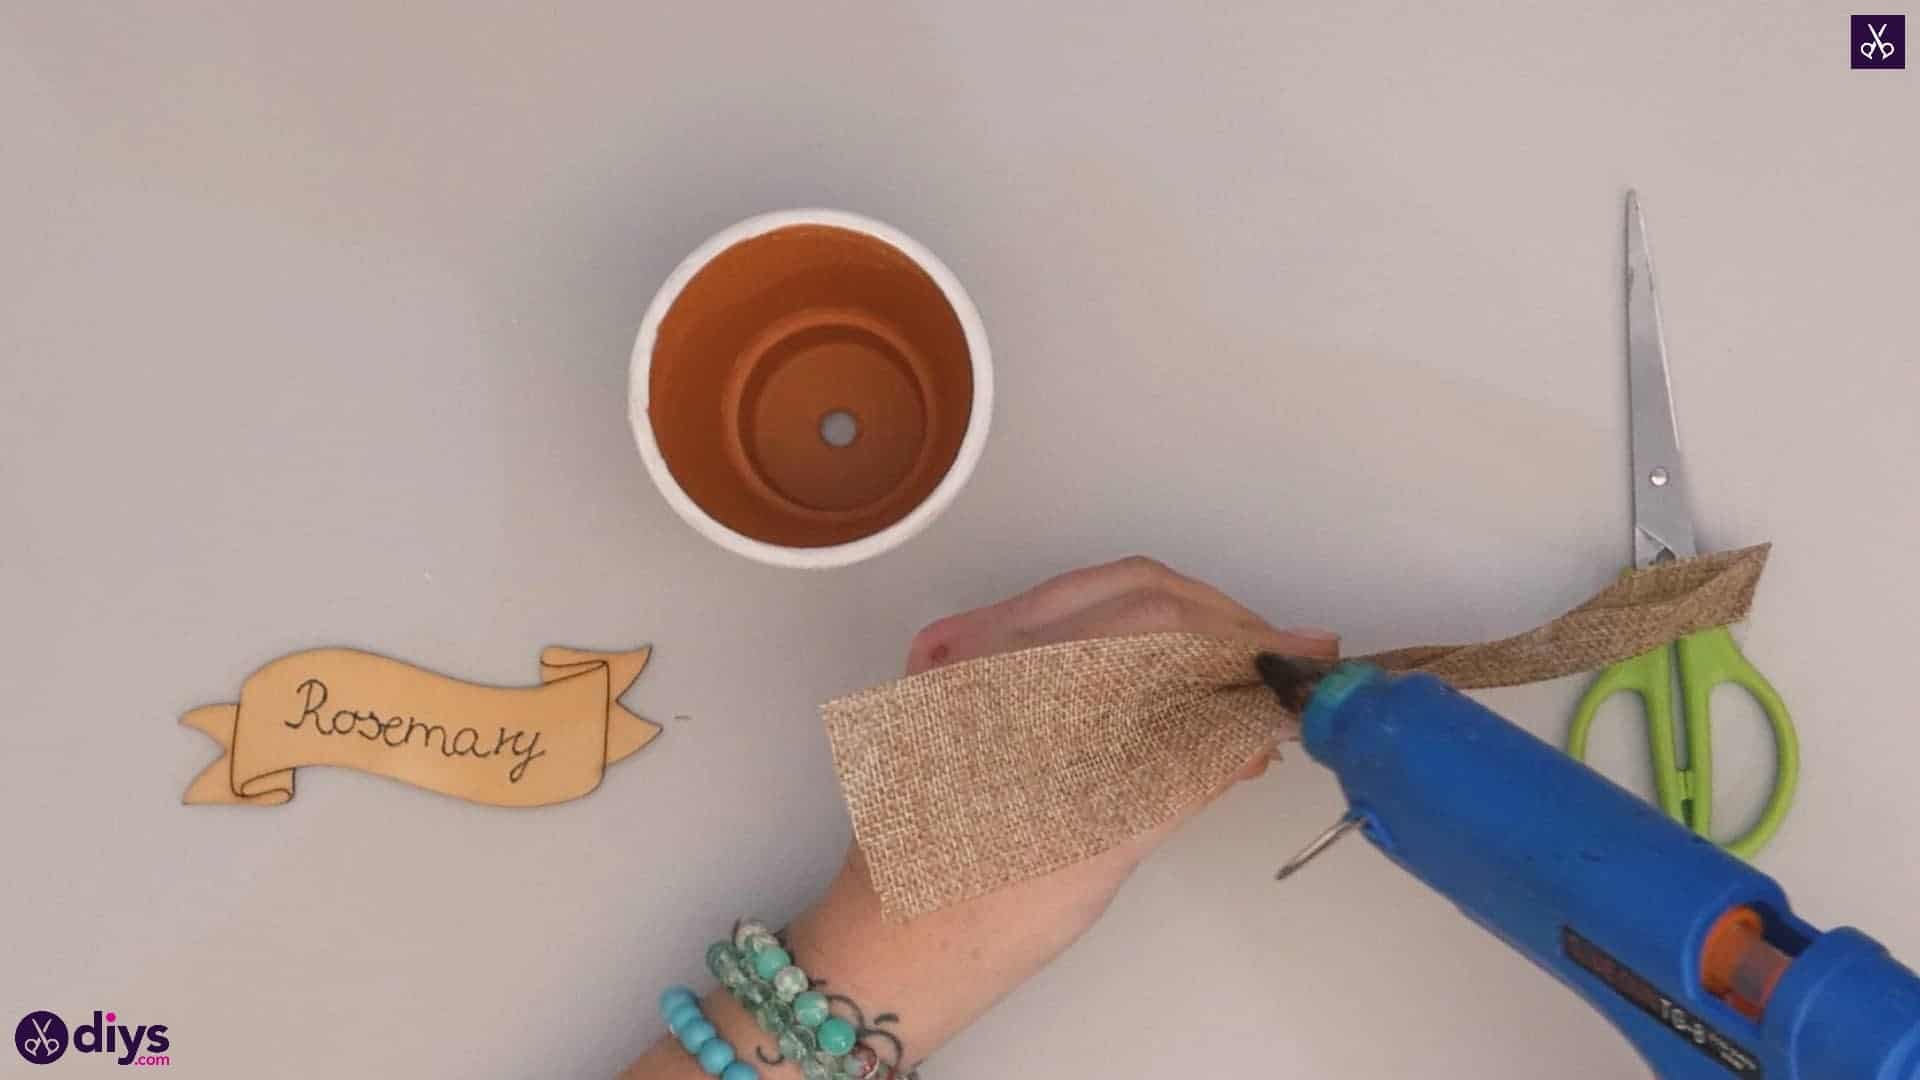 Diy rustic terra cotta flower pot step 3